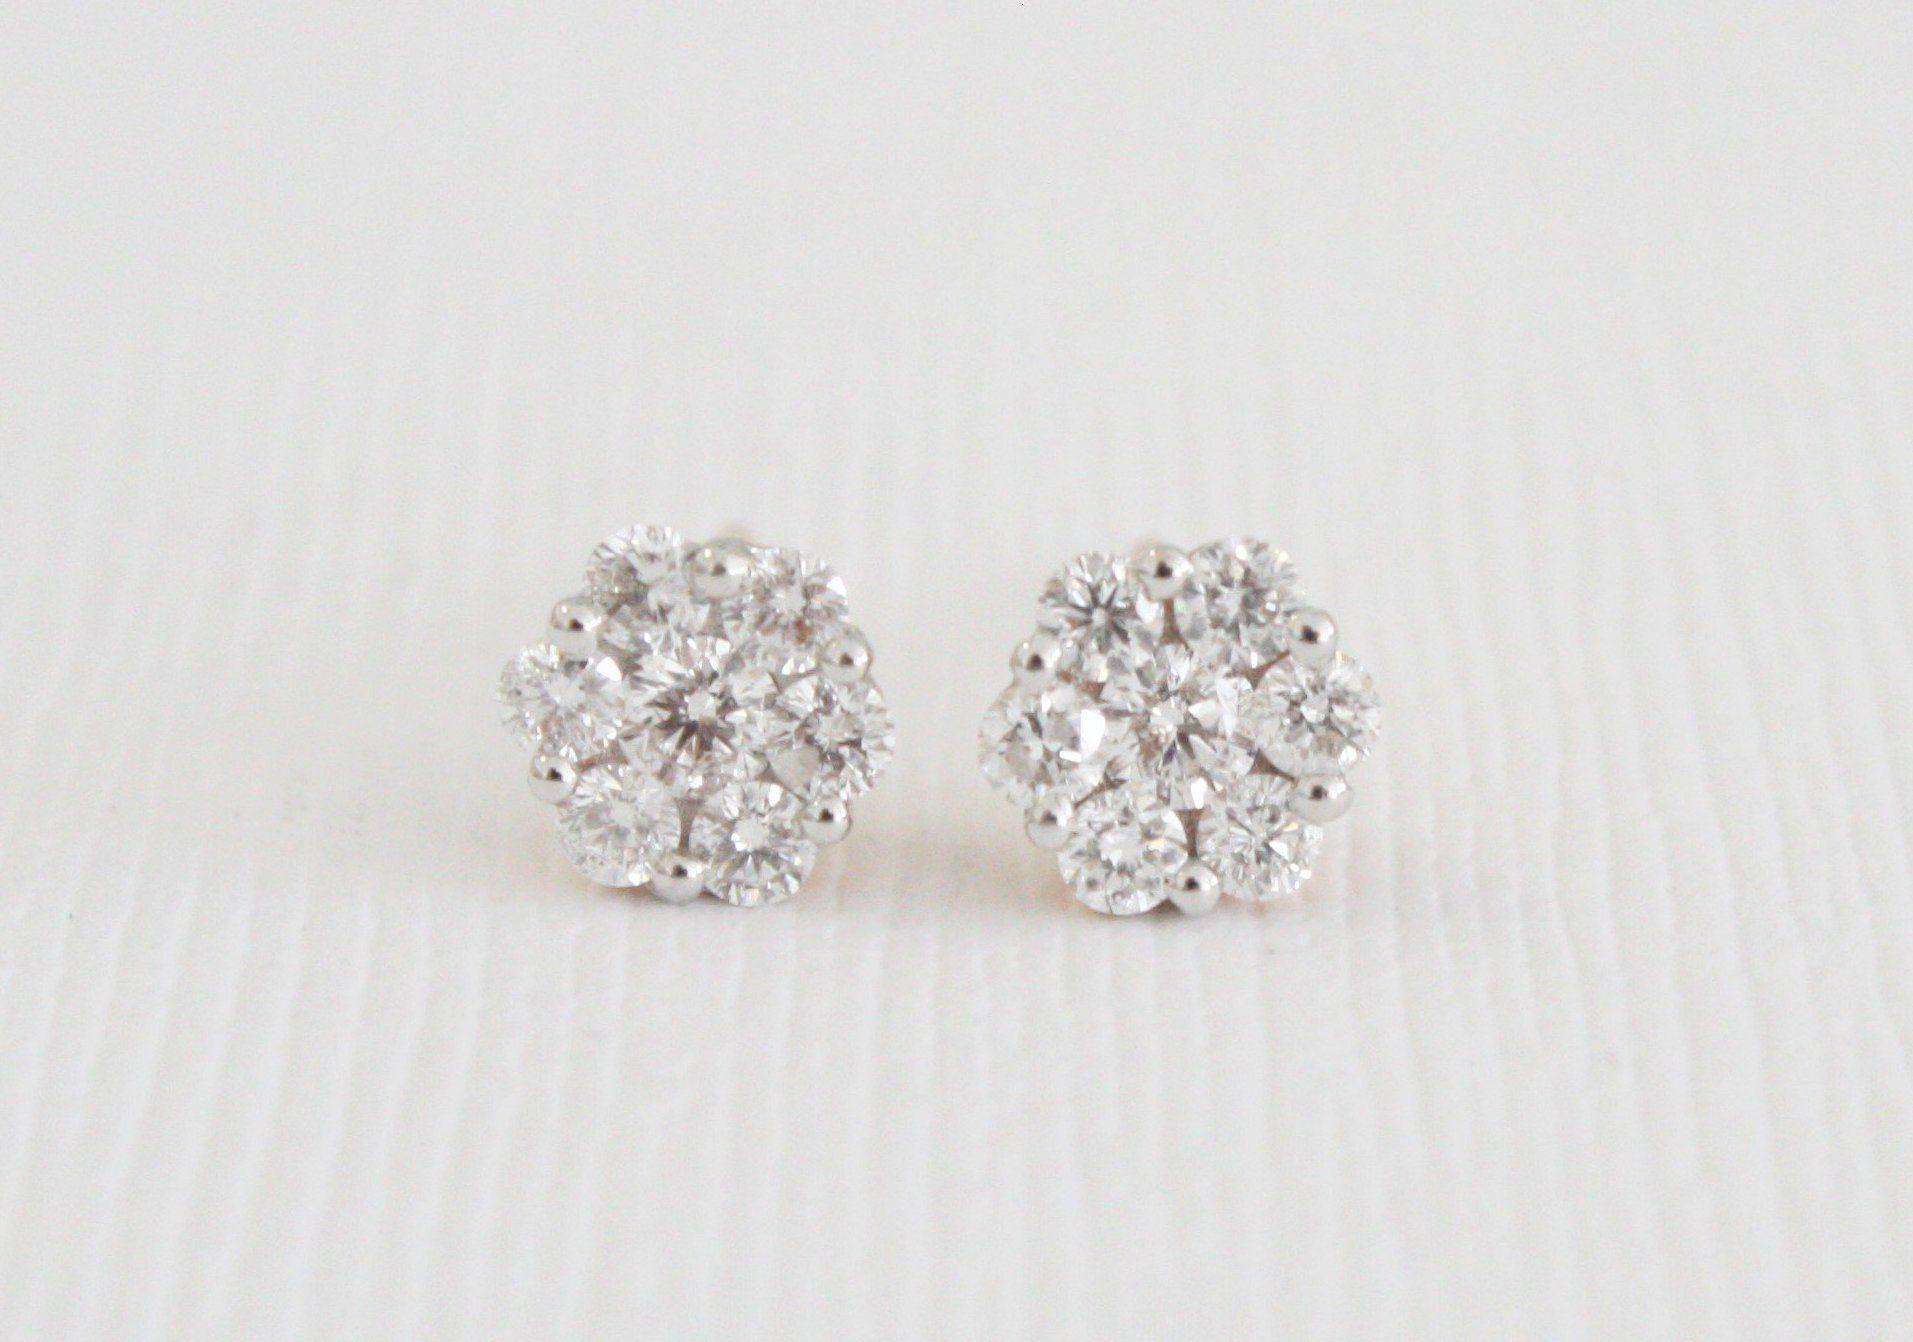 Diamond Flower Cluster Stud Earrings In 18k Rose Gold Wedding Jewelry Earrings Stud Earrings 18k Rose Gold Earrings